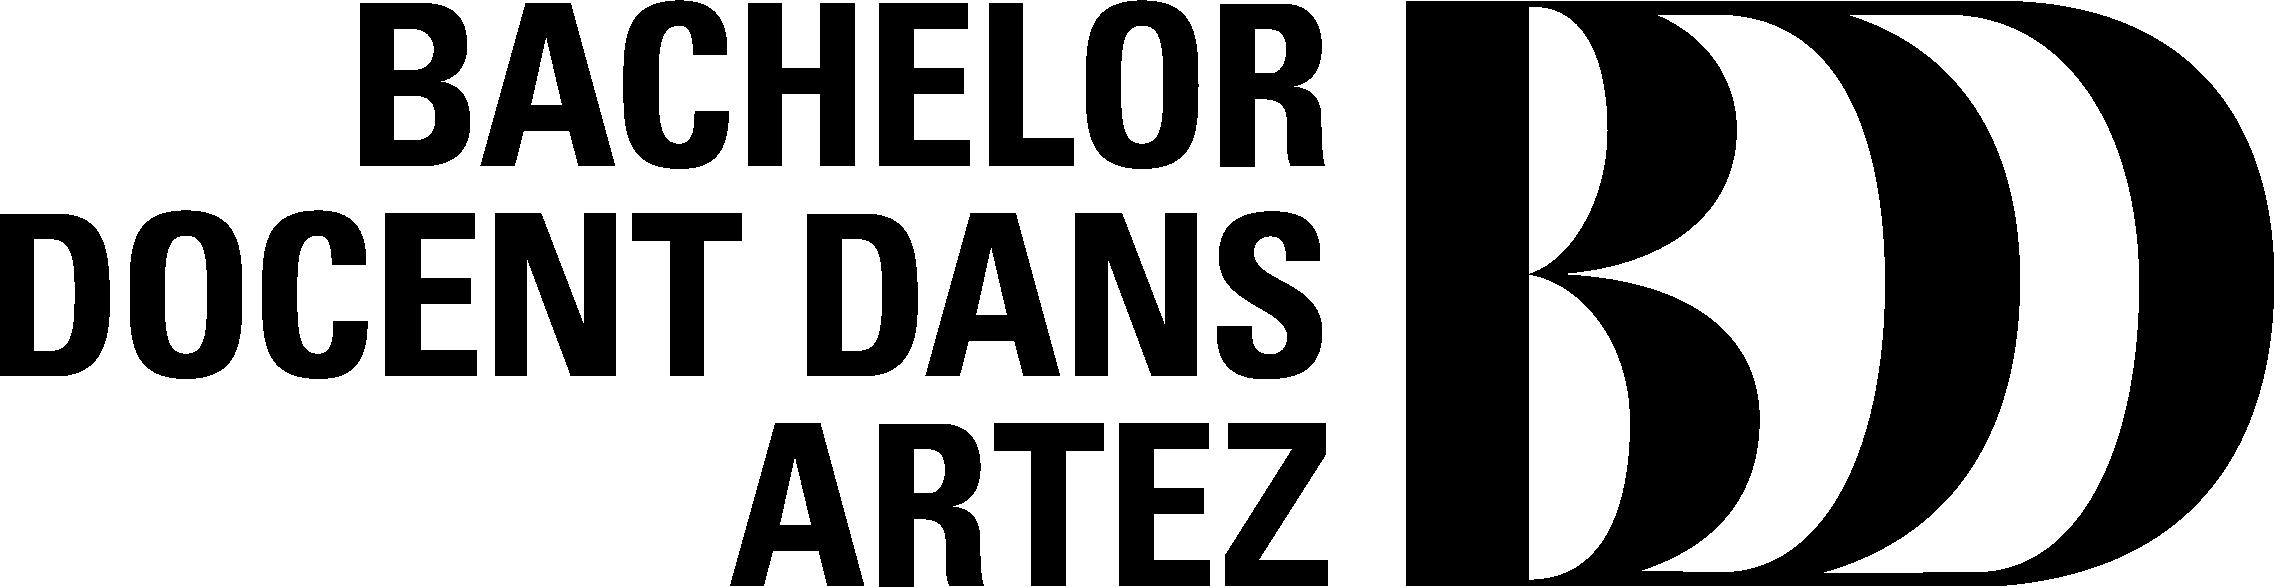 zw-docent-dans-logo.png